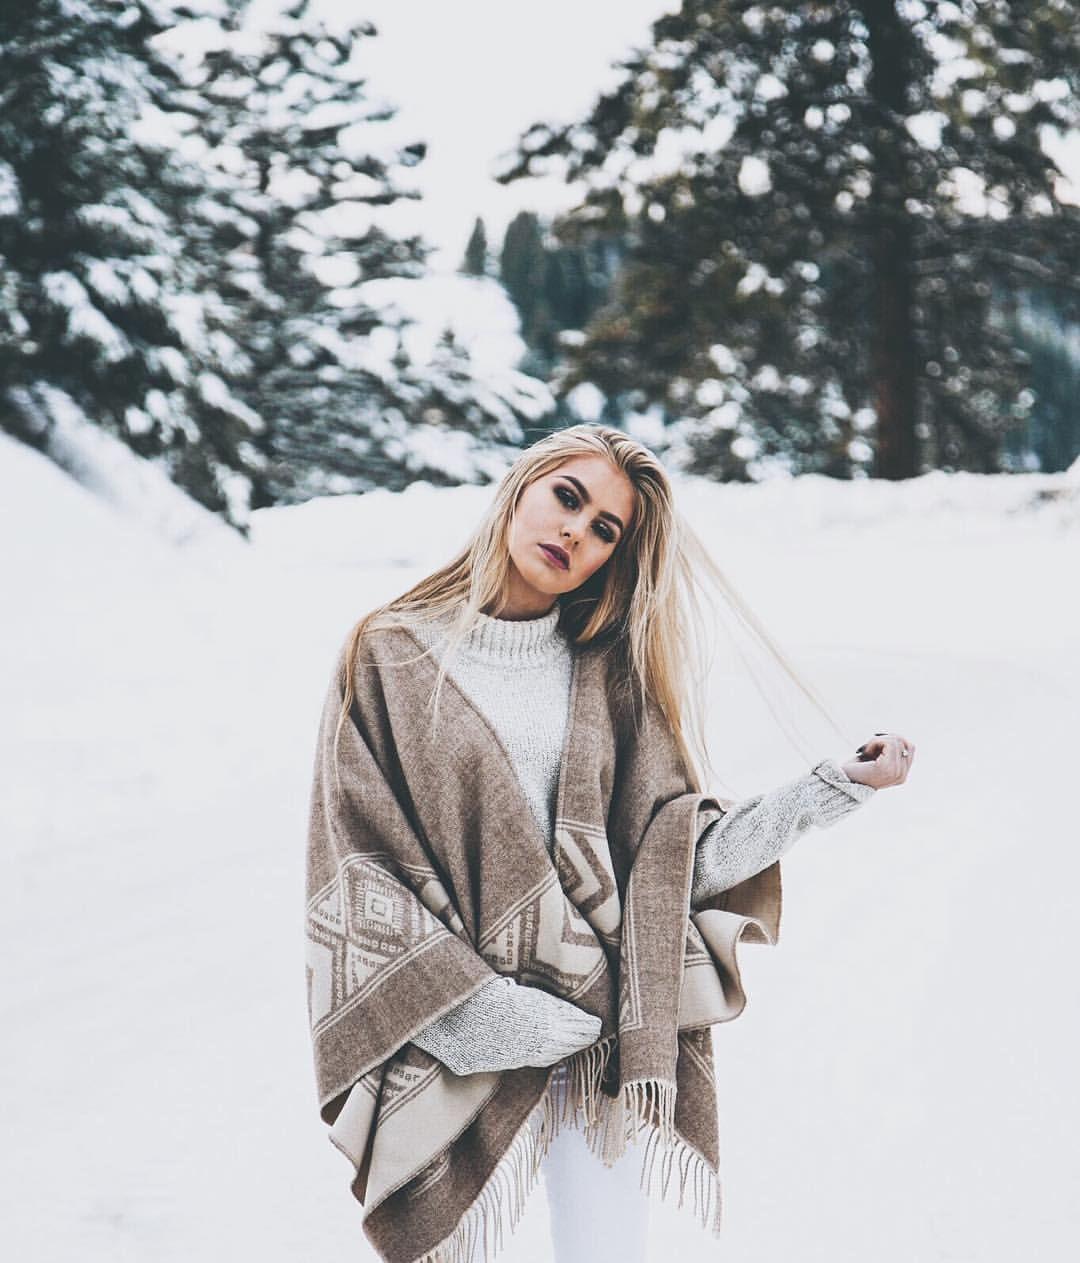 Winter Fashion Shoot